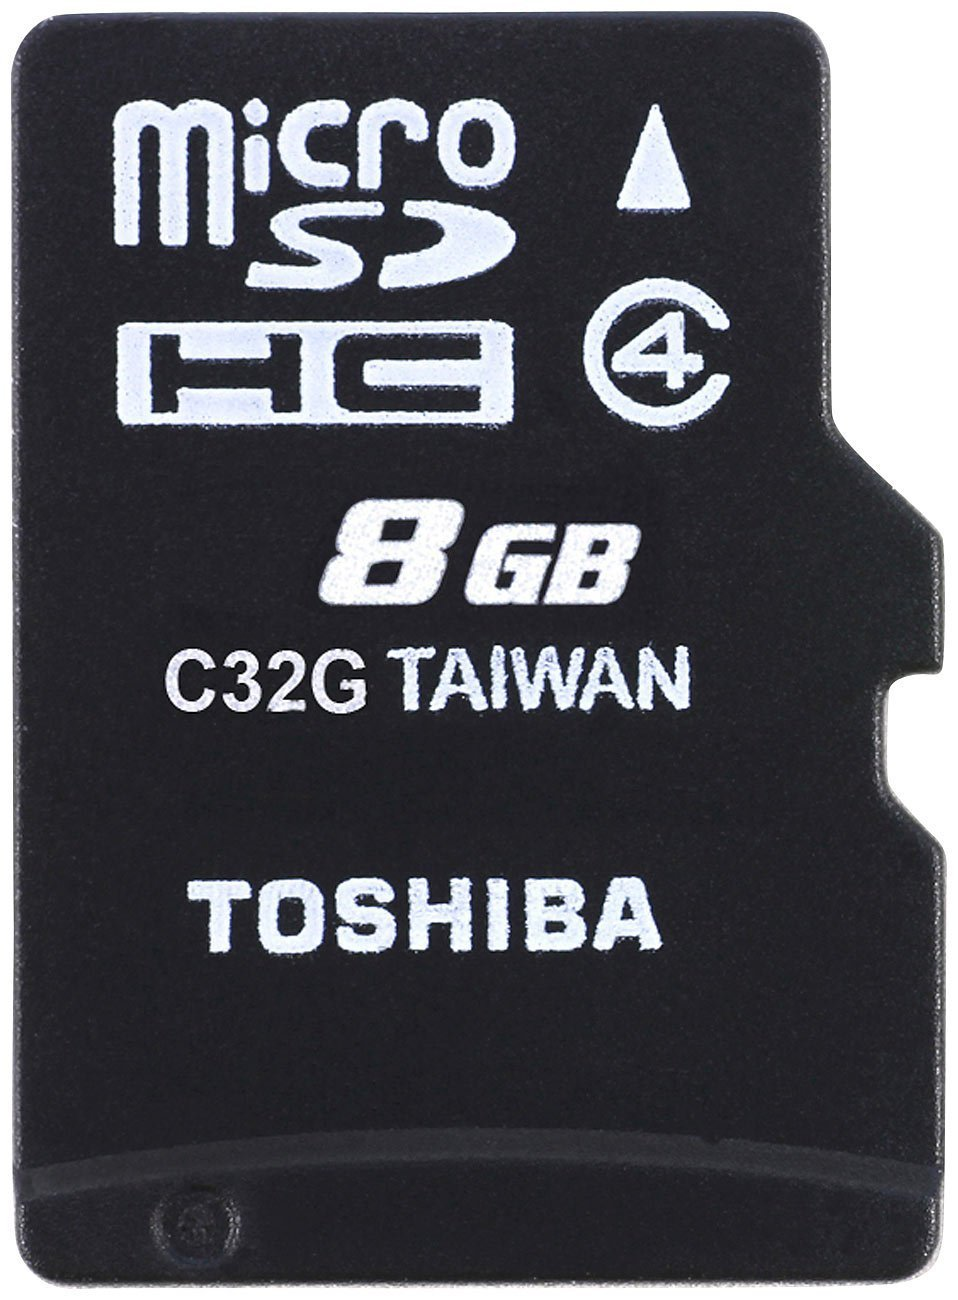 Toshiba 8GB MicroSDHC Class 4 Memory Card..